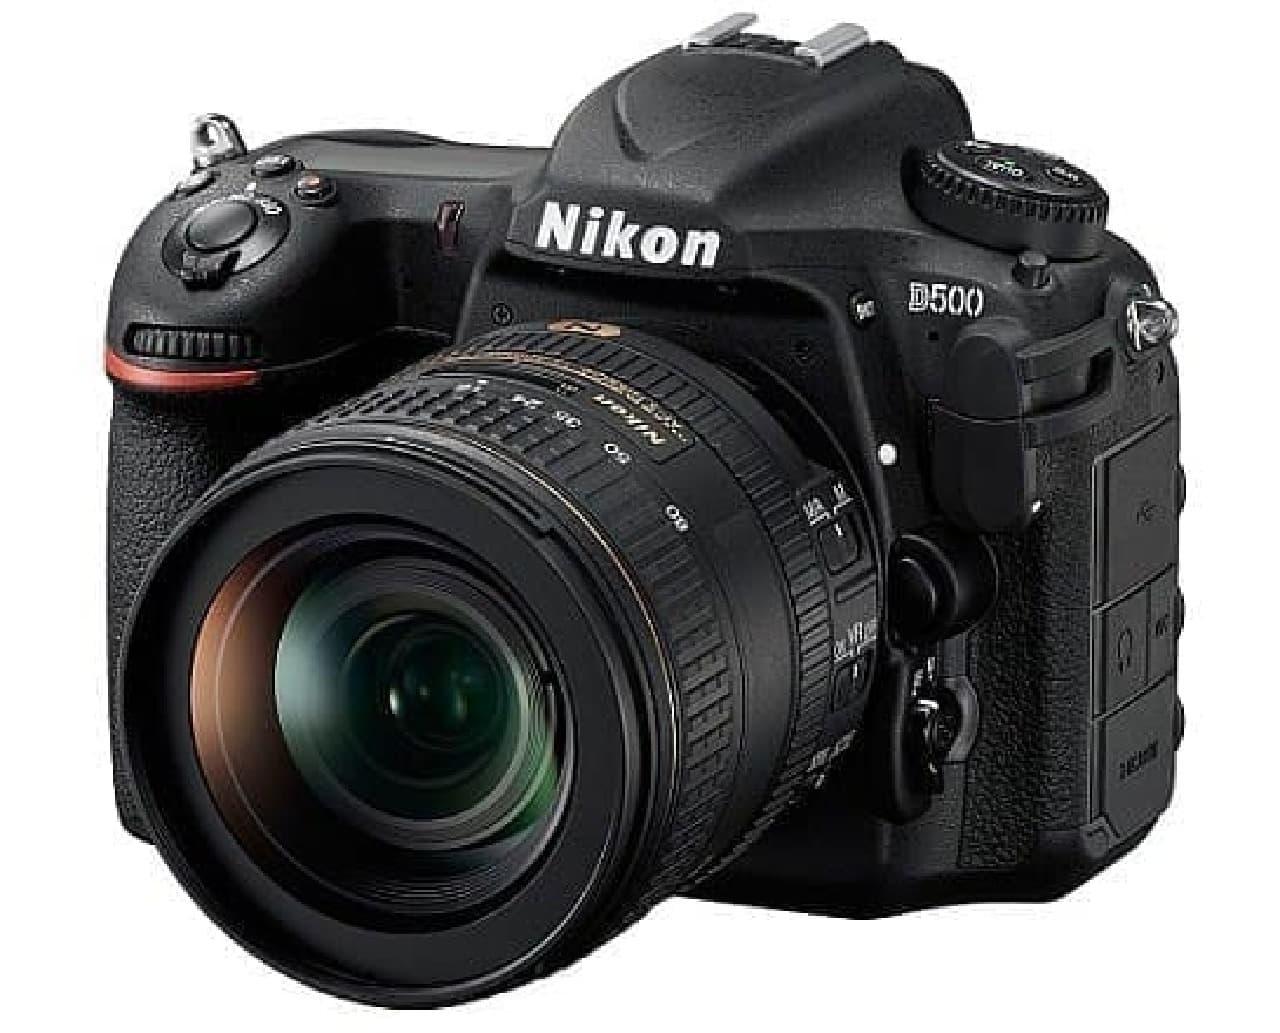 「ニコン D500」  AF-S DX NIKKOR 16-80mm f/2.8-4E ED VR装着時